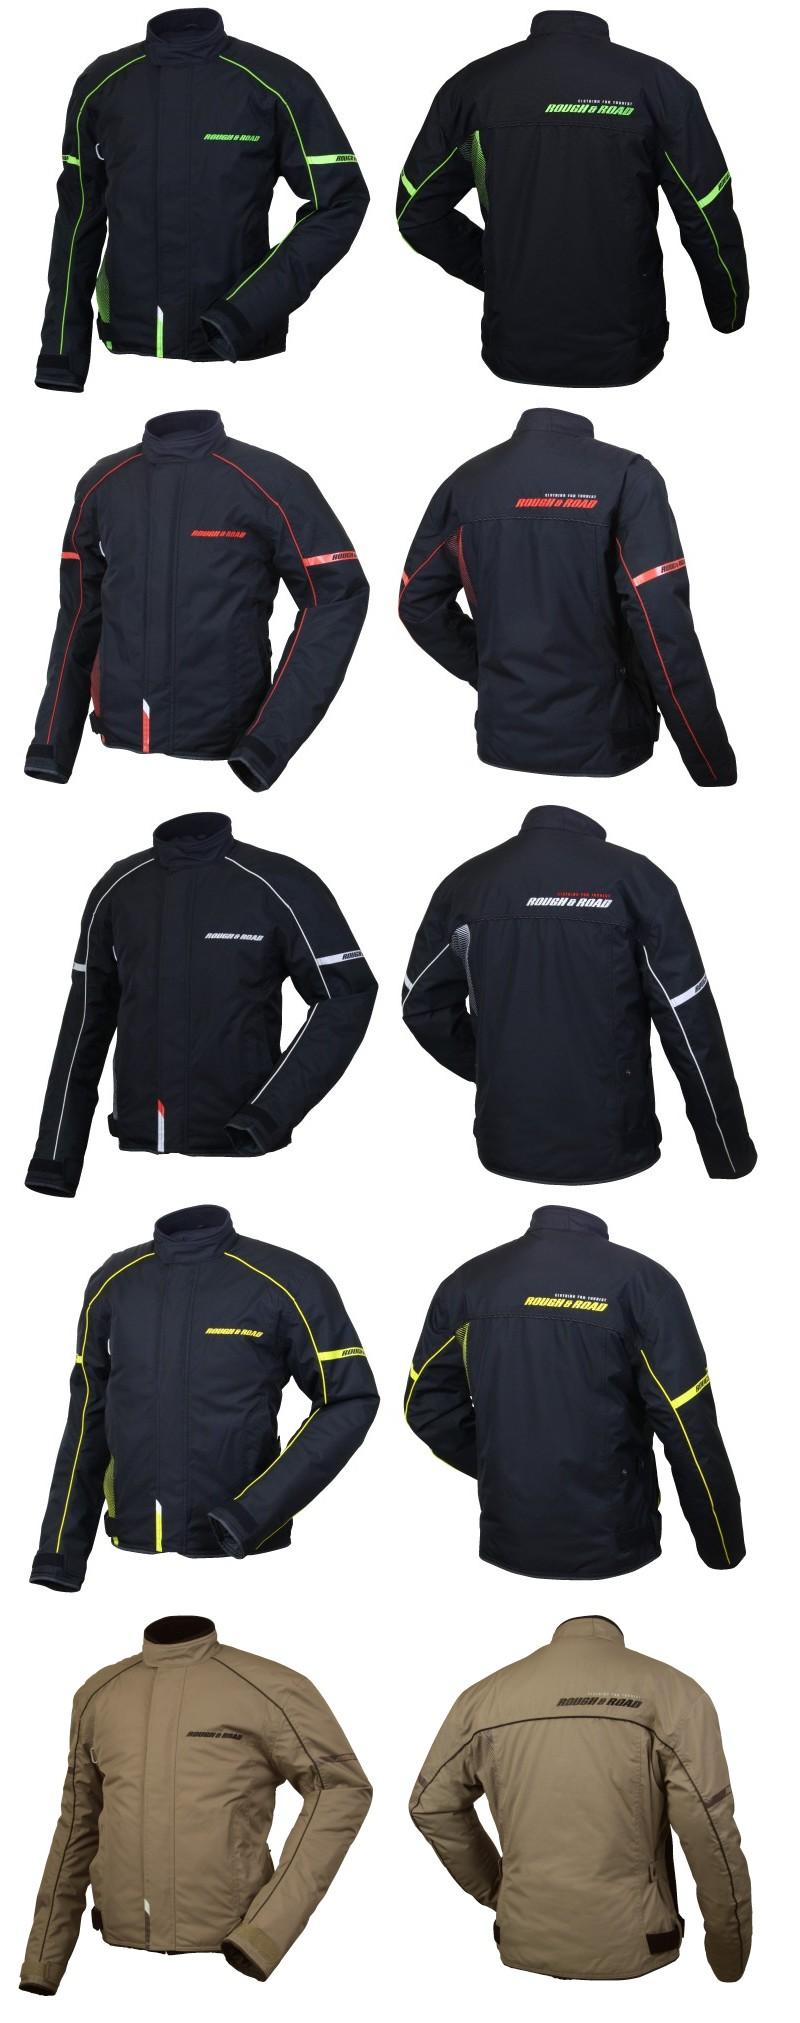 【ROUGH&ROAD】Dual tex冬季騎士夾克 - 「Webike-摩托百貨」